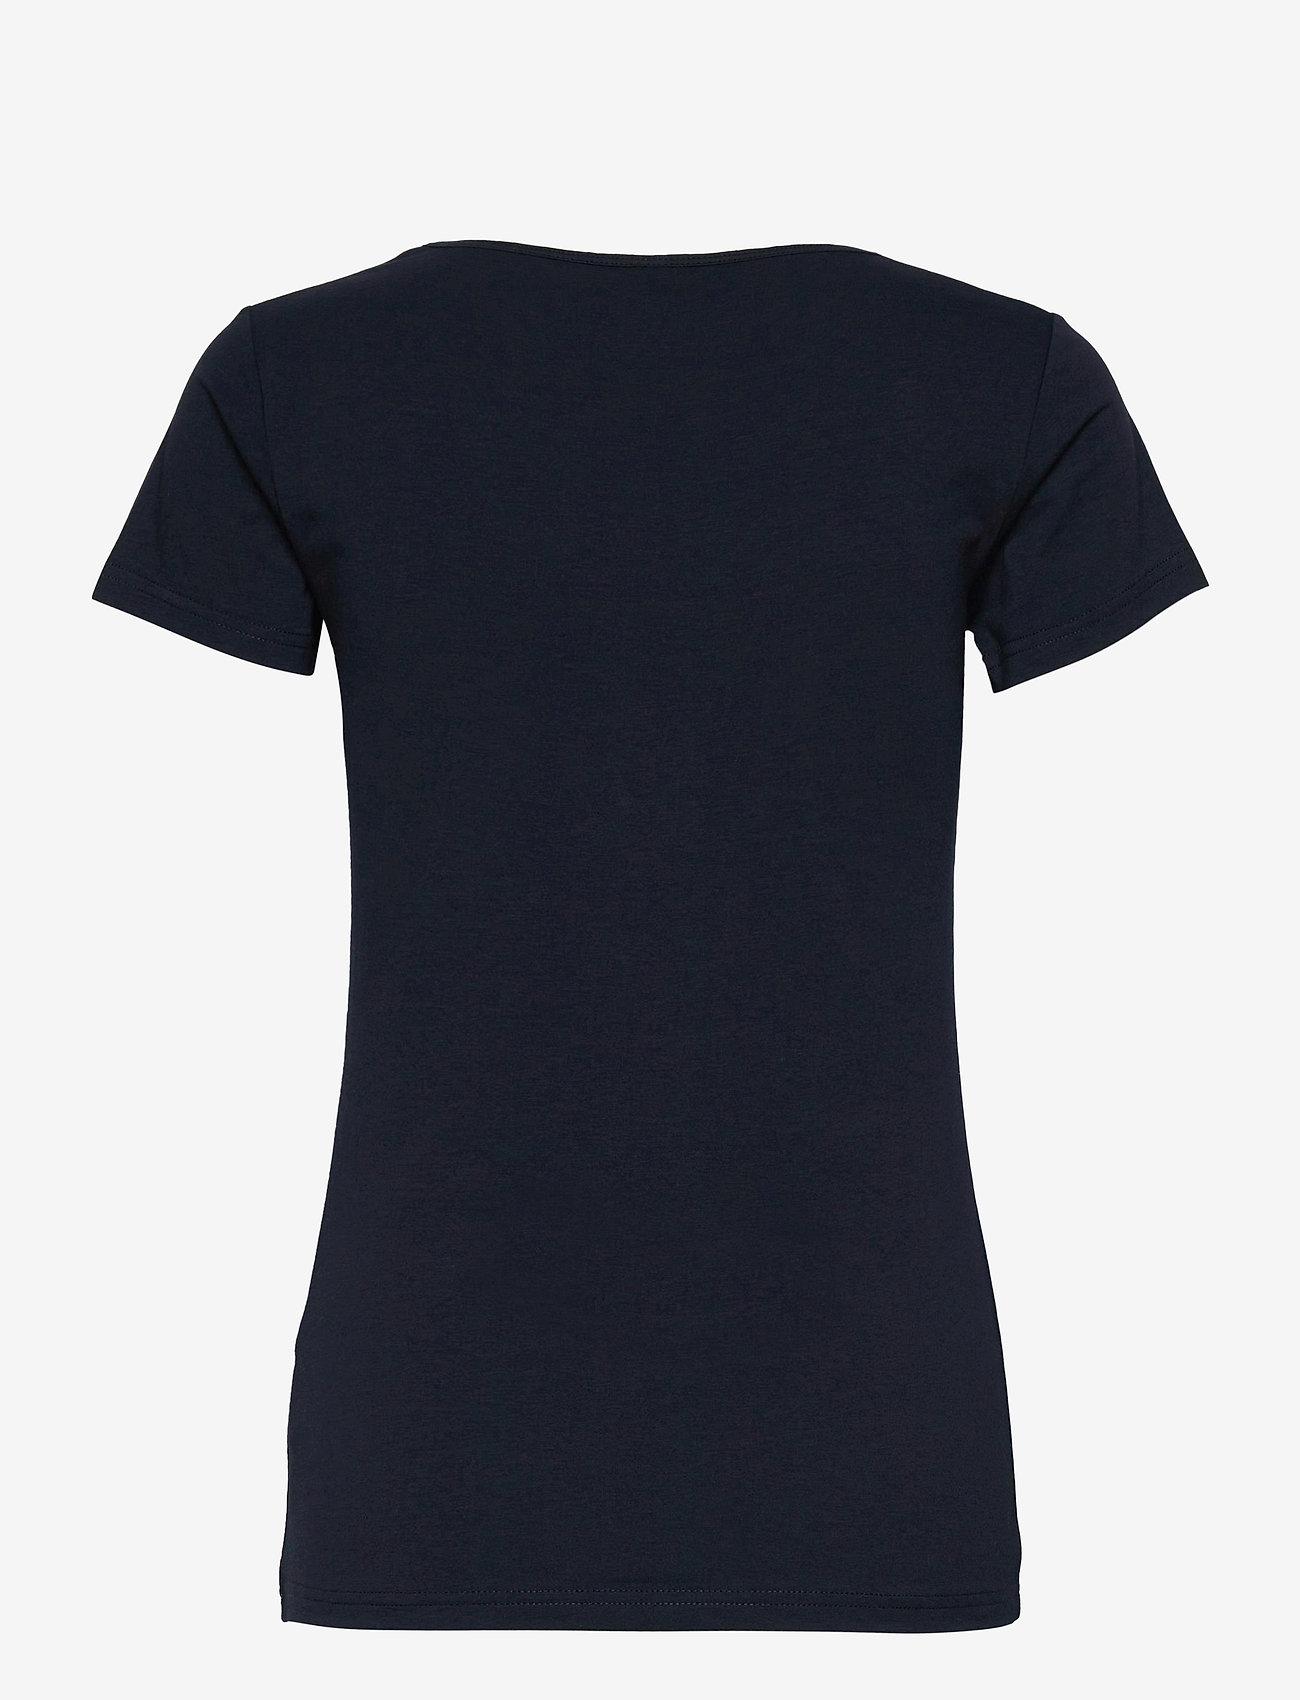 Soyaconcept - SC-PYLLE - t-shirt & tops - navy - 1